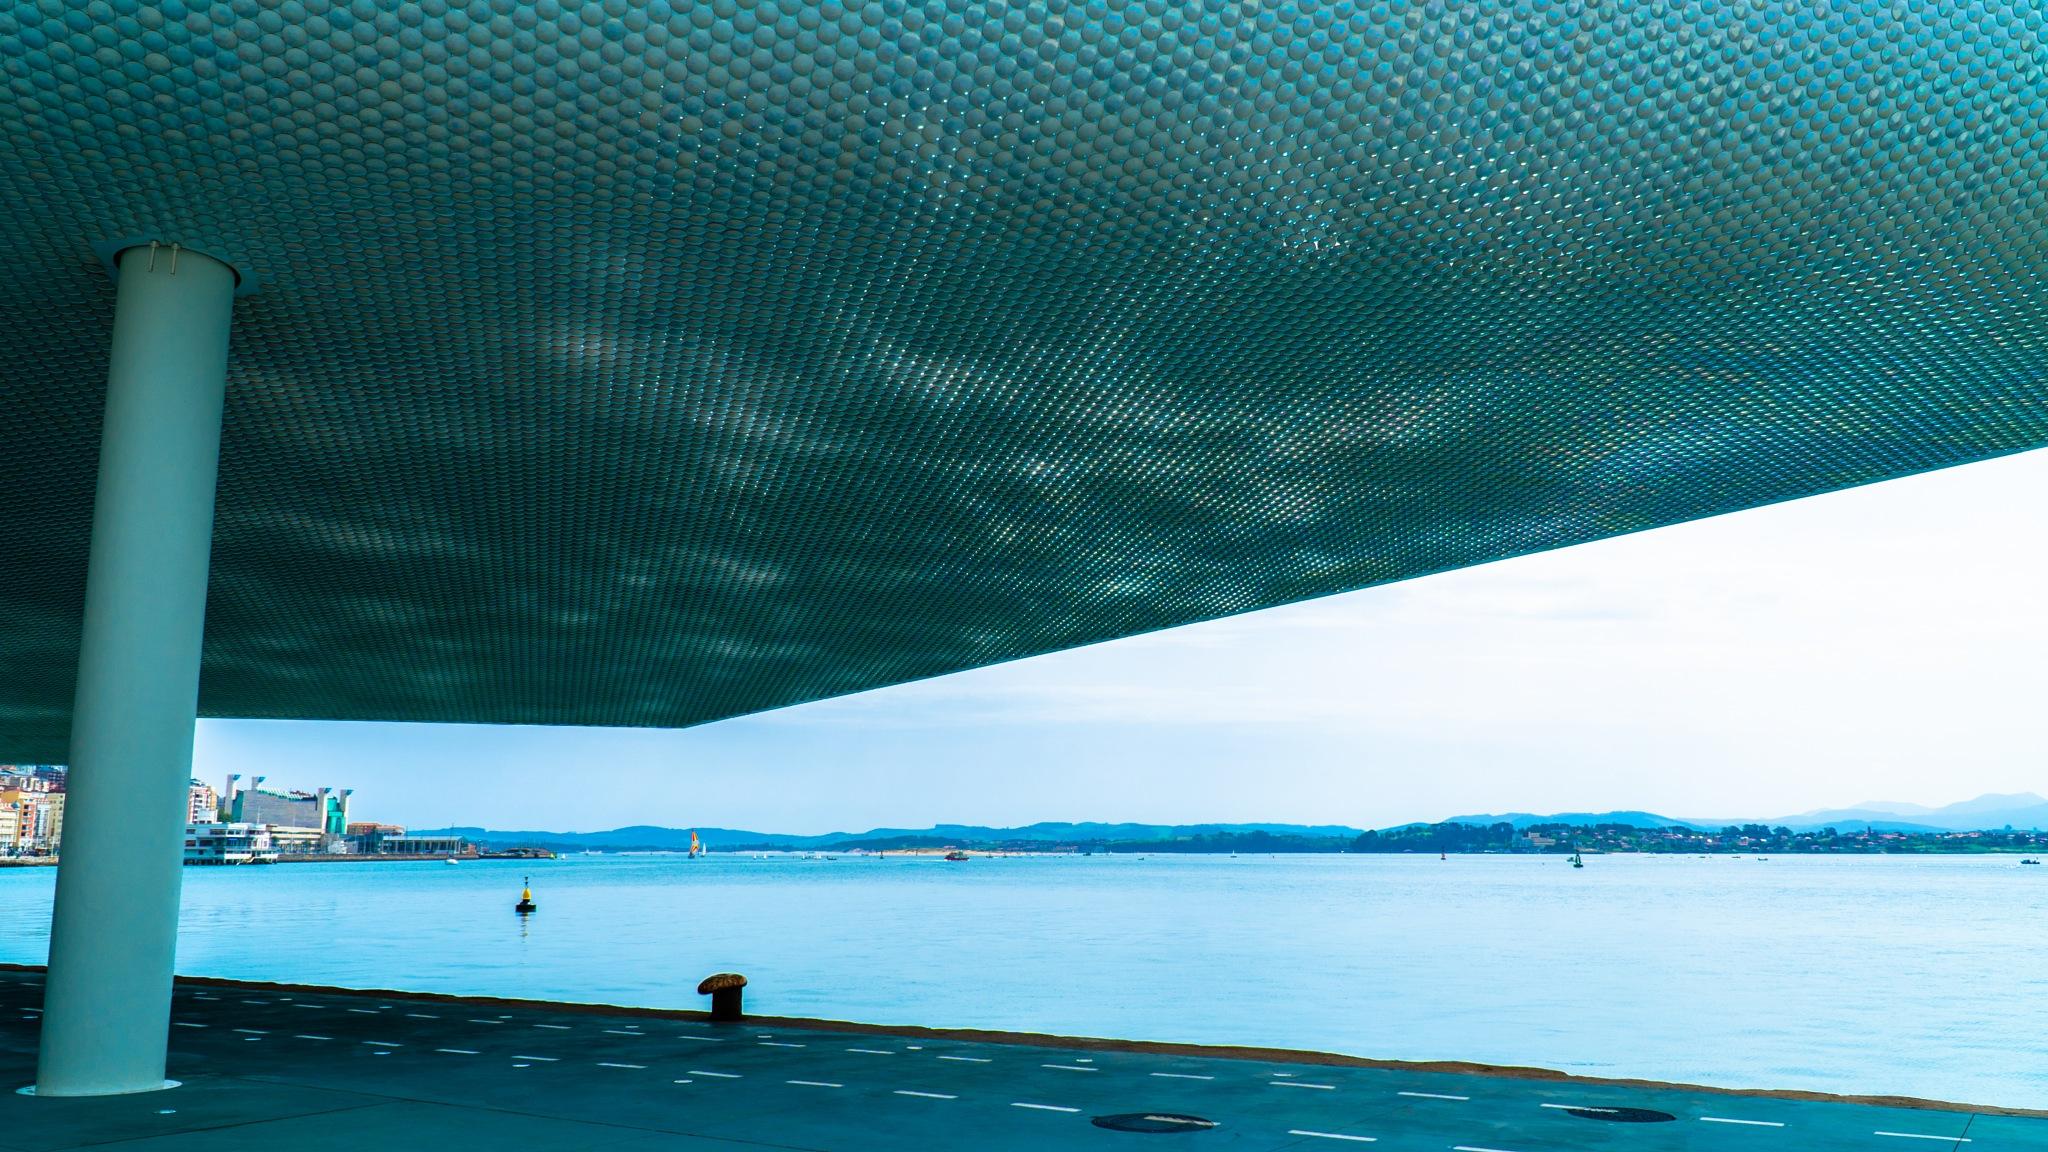 Santander Bay by Lukealbright